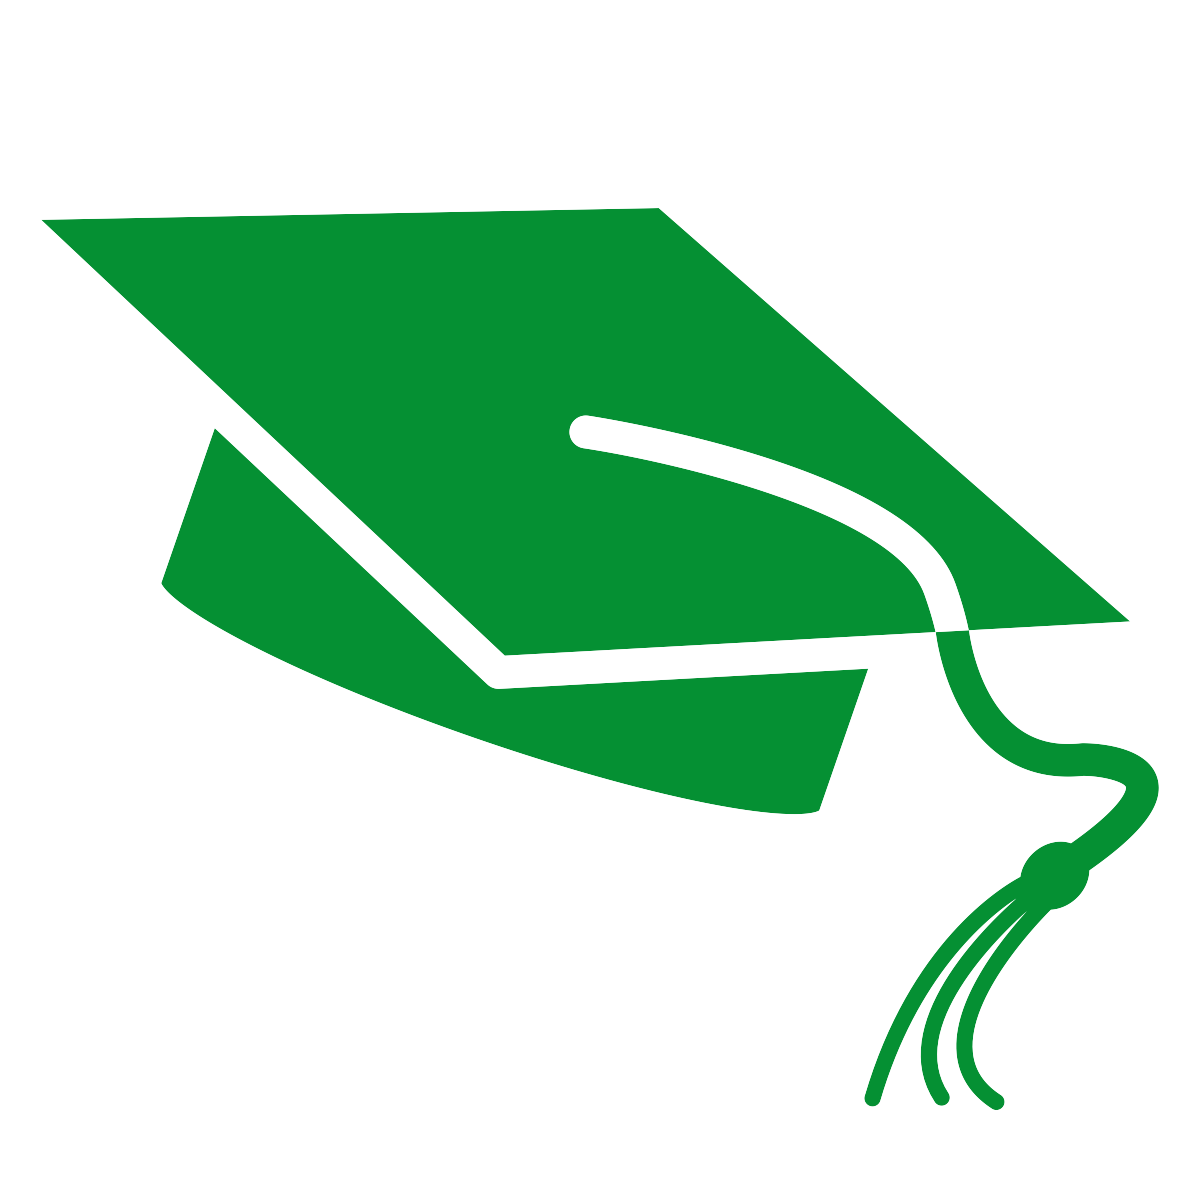 2018 graduation blocks clipart png image freeuse Grad Block Party | Commencement image freeuse